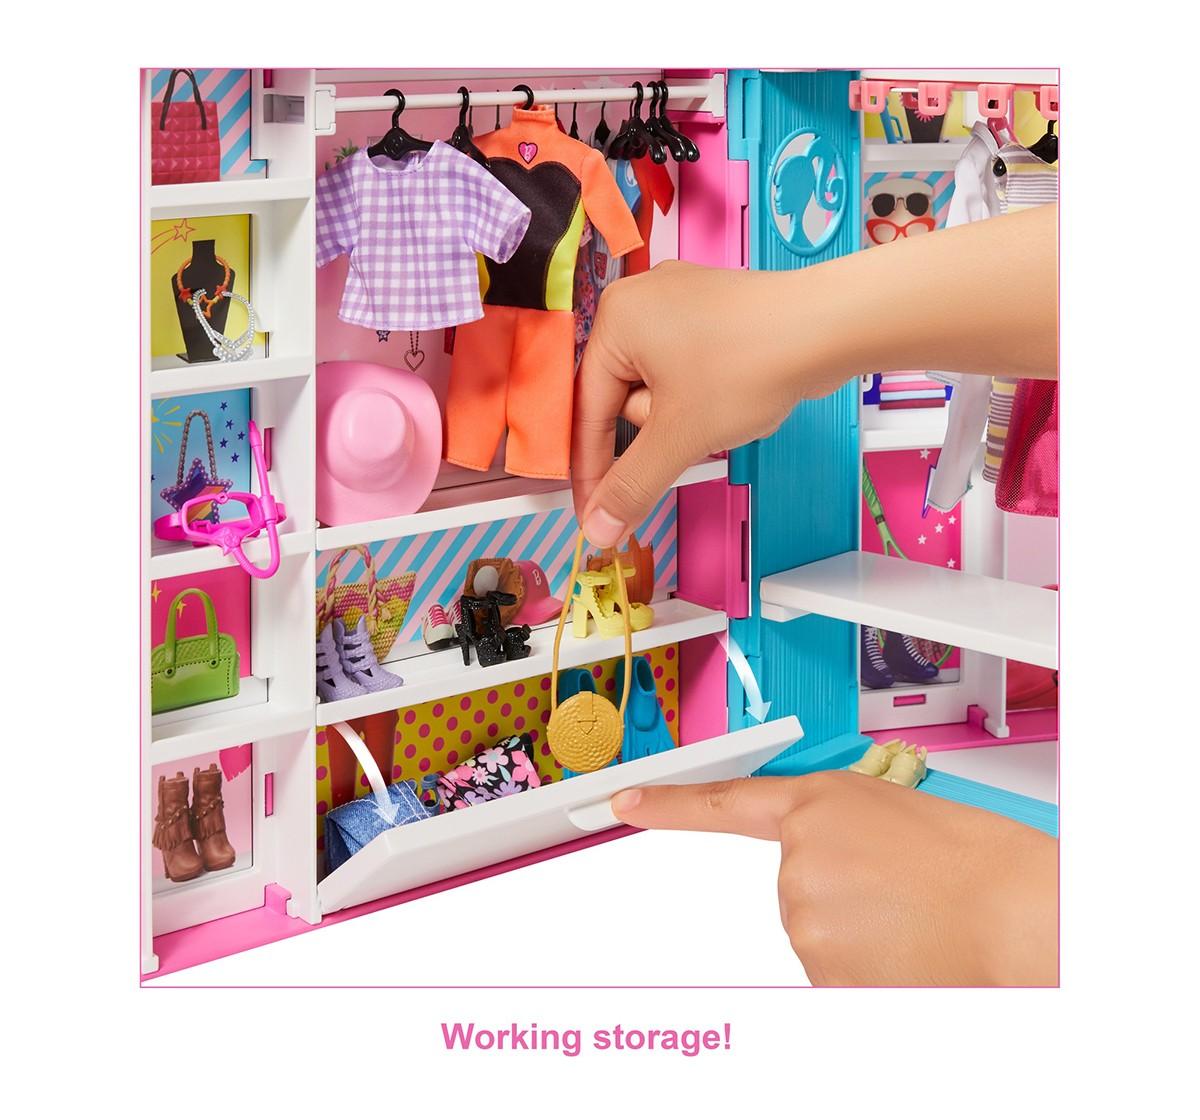 Barbie Dream Closet Dolls & Accessories for Girls age 3Y+